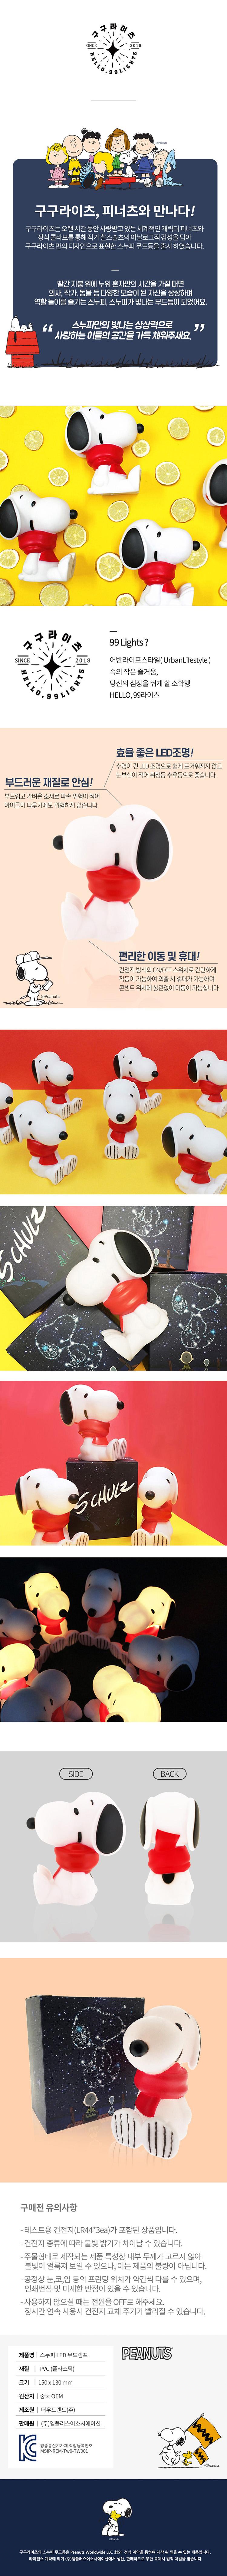 Snoopy_Lamp_all.jpg